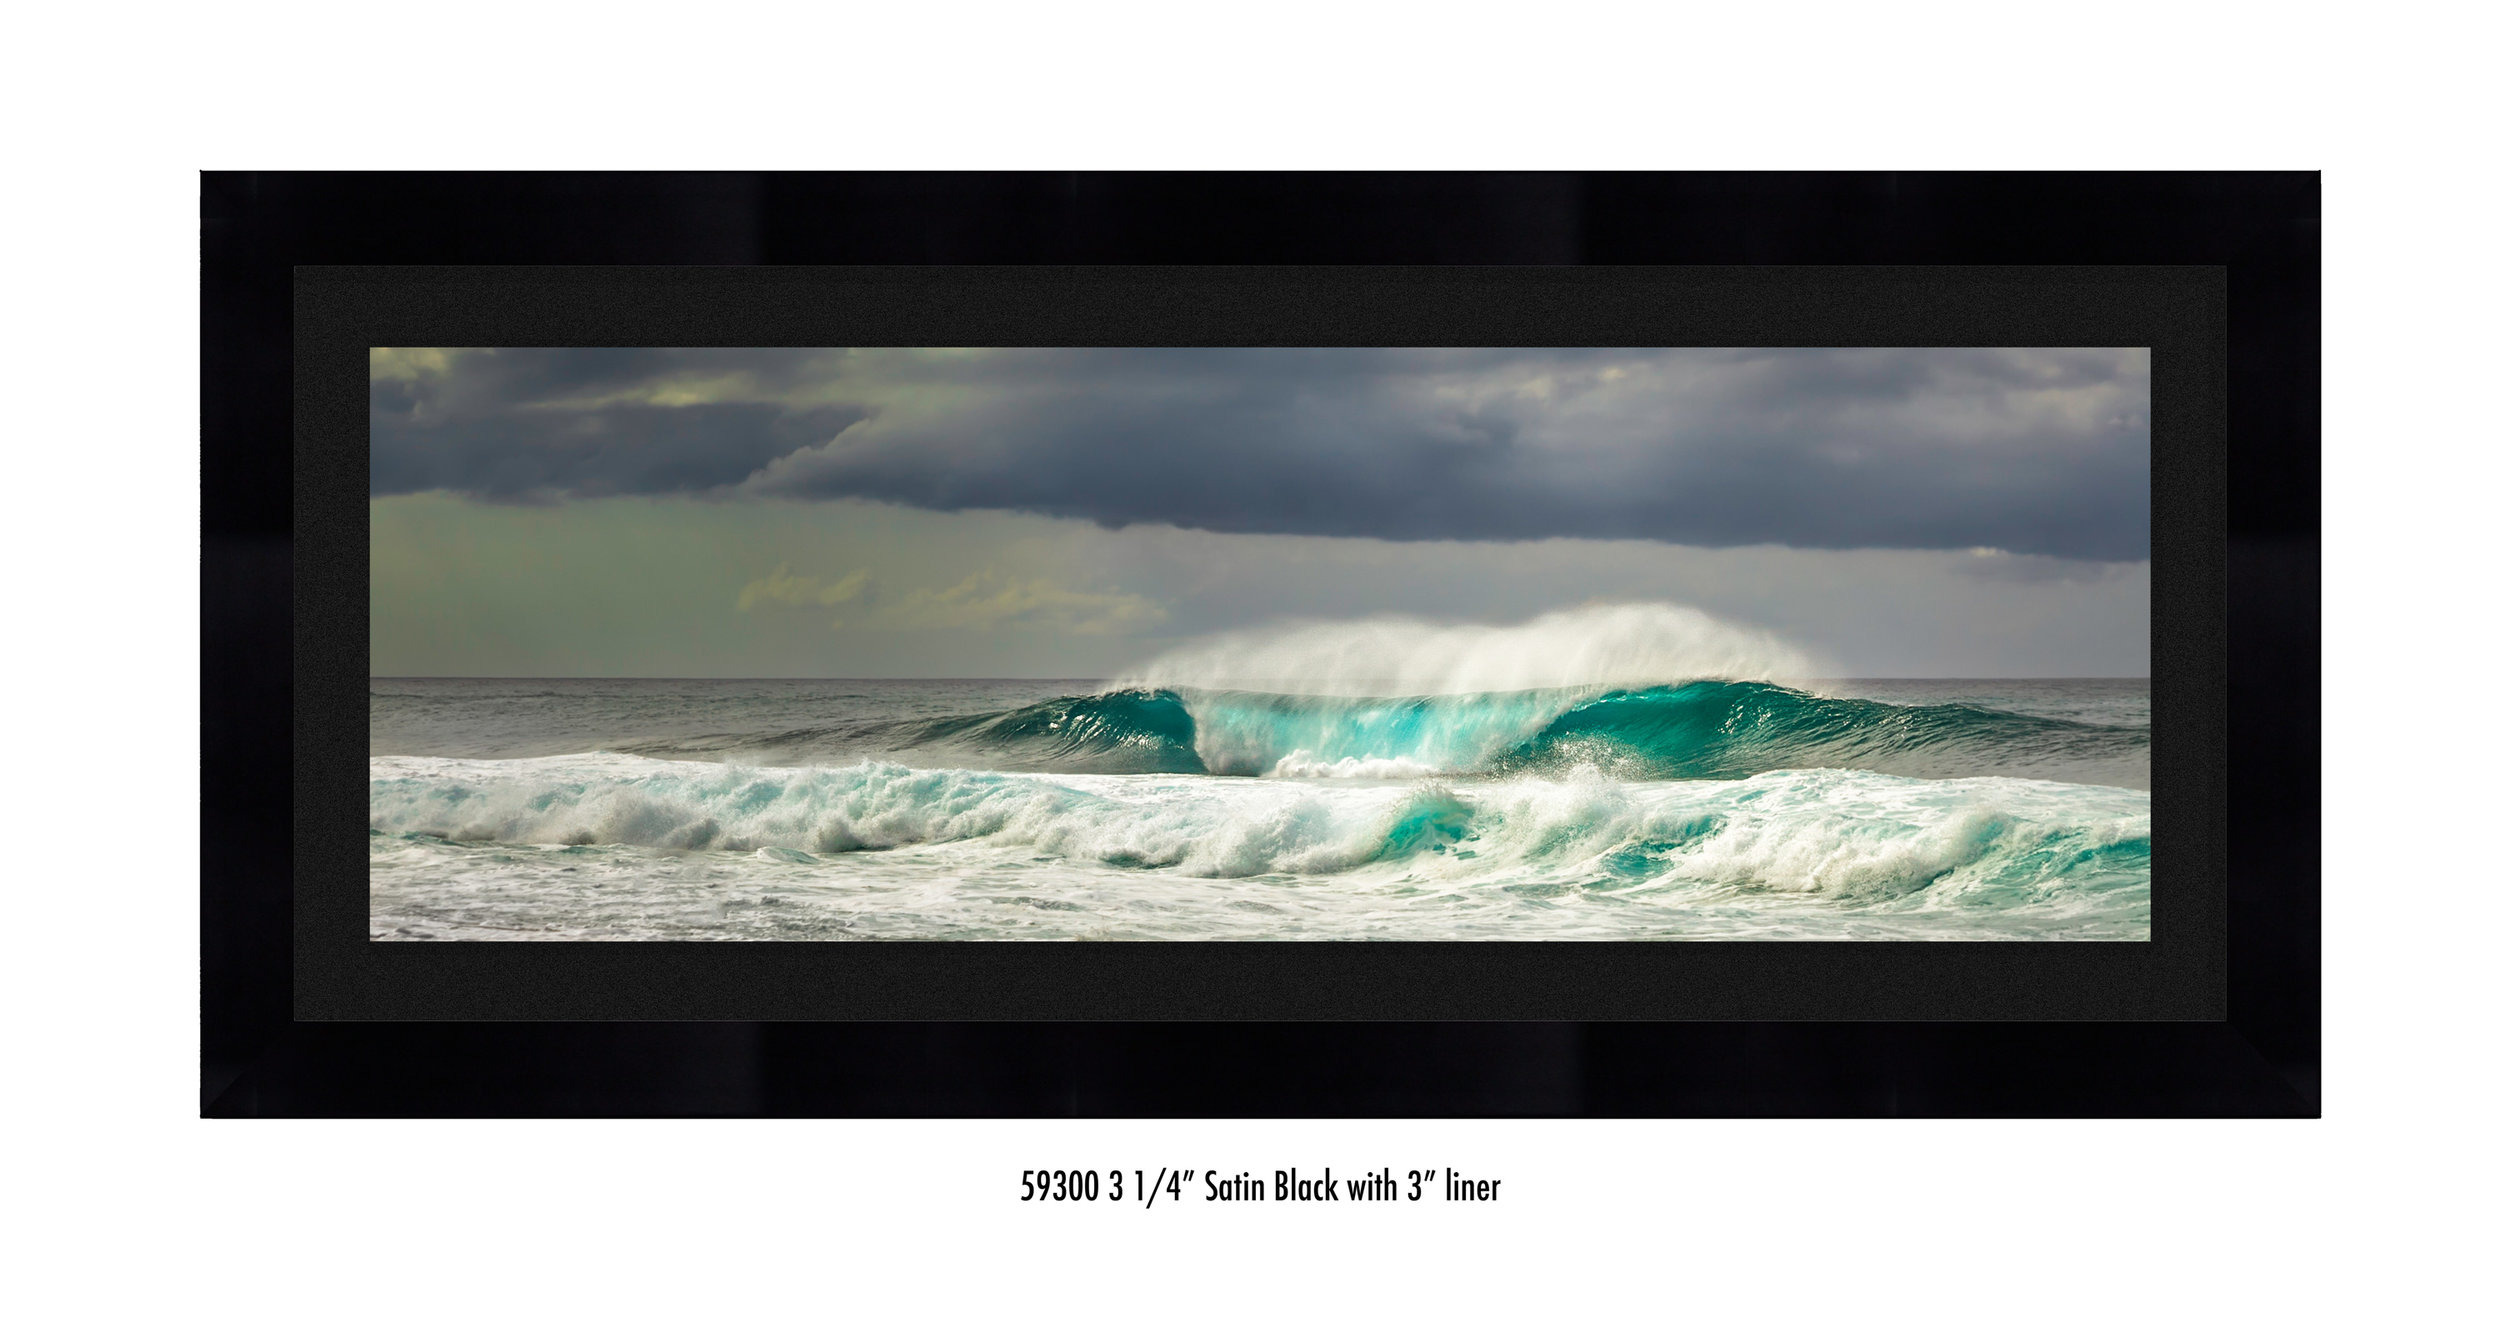 First-Reef-59300-blk.jpg